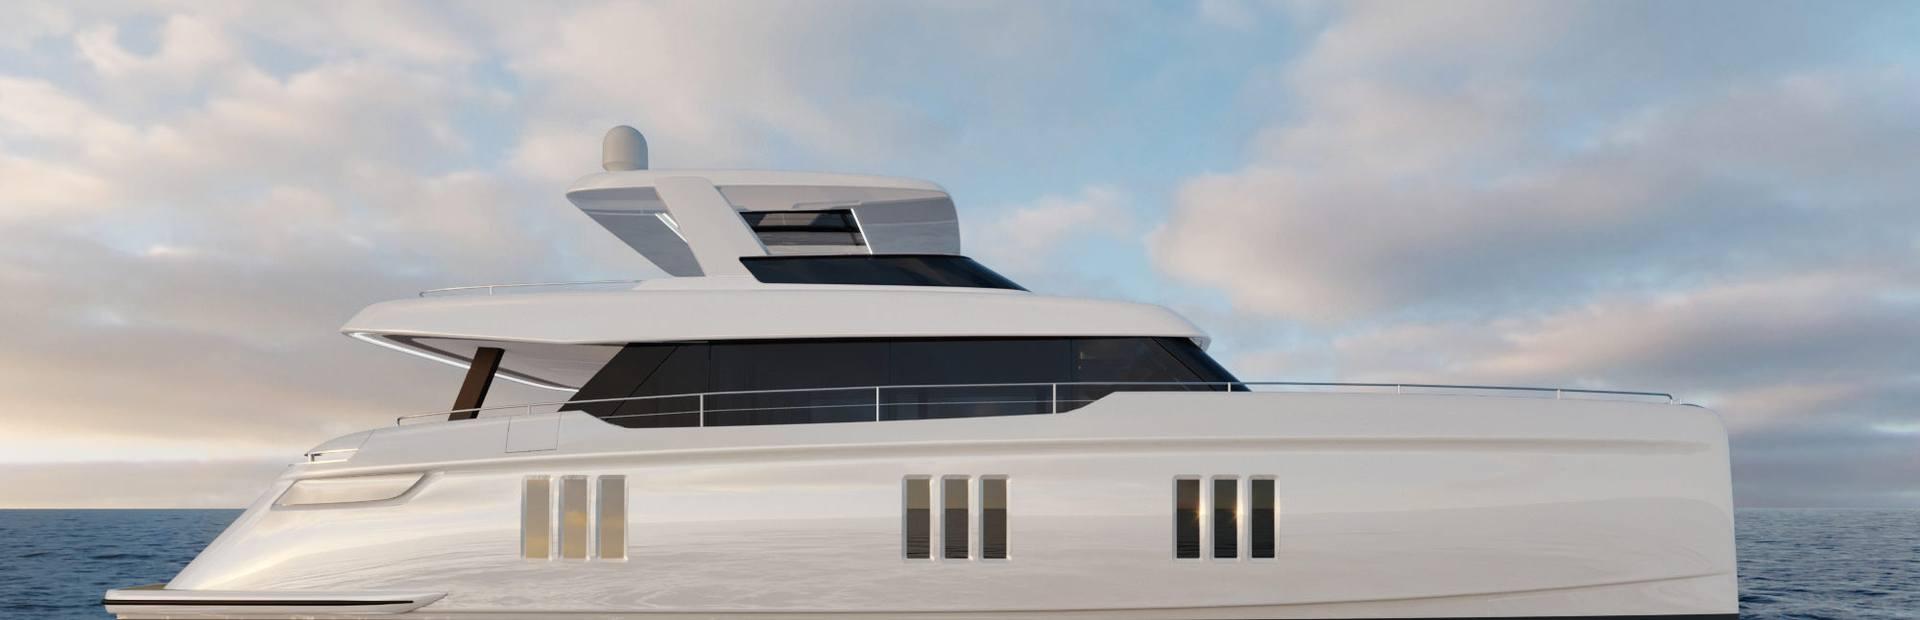 70 Sunreef Power Yacht Charter